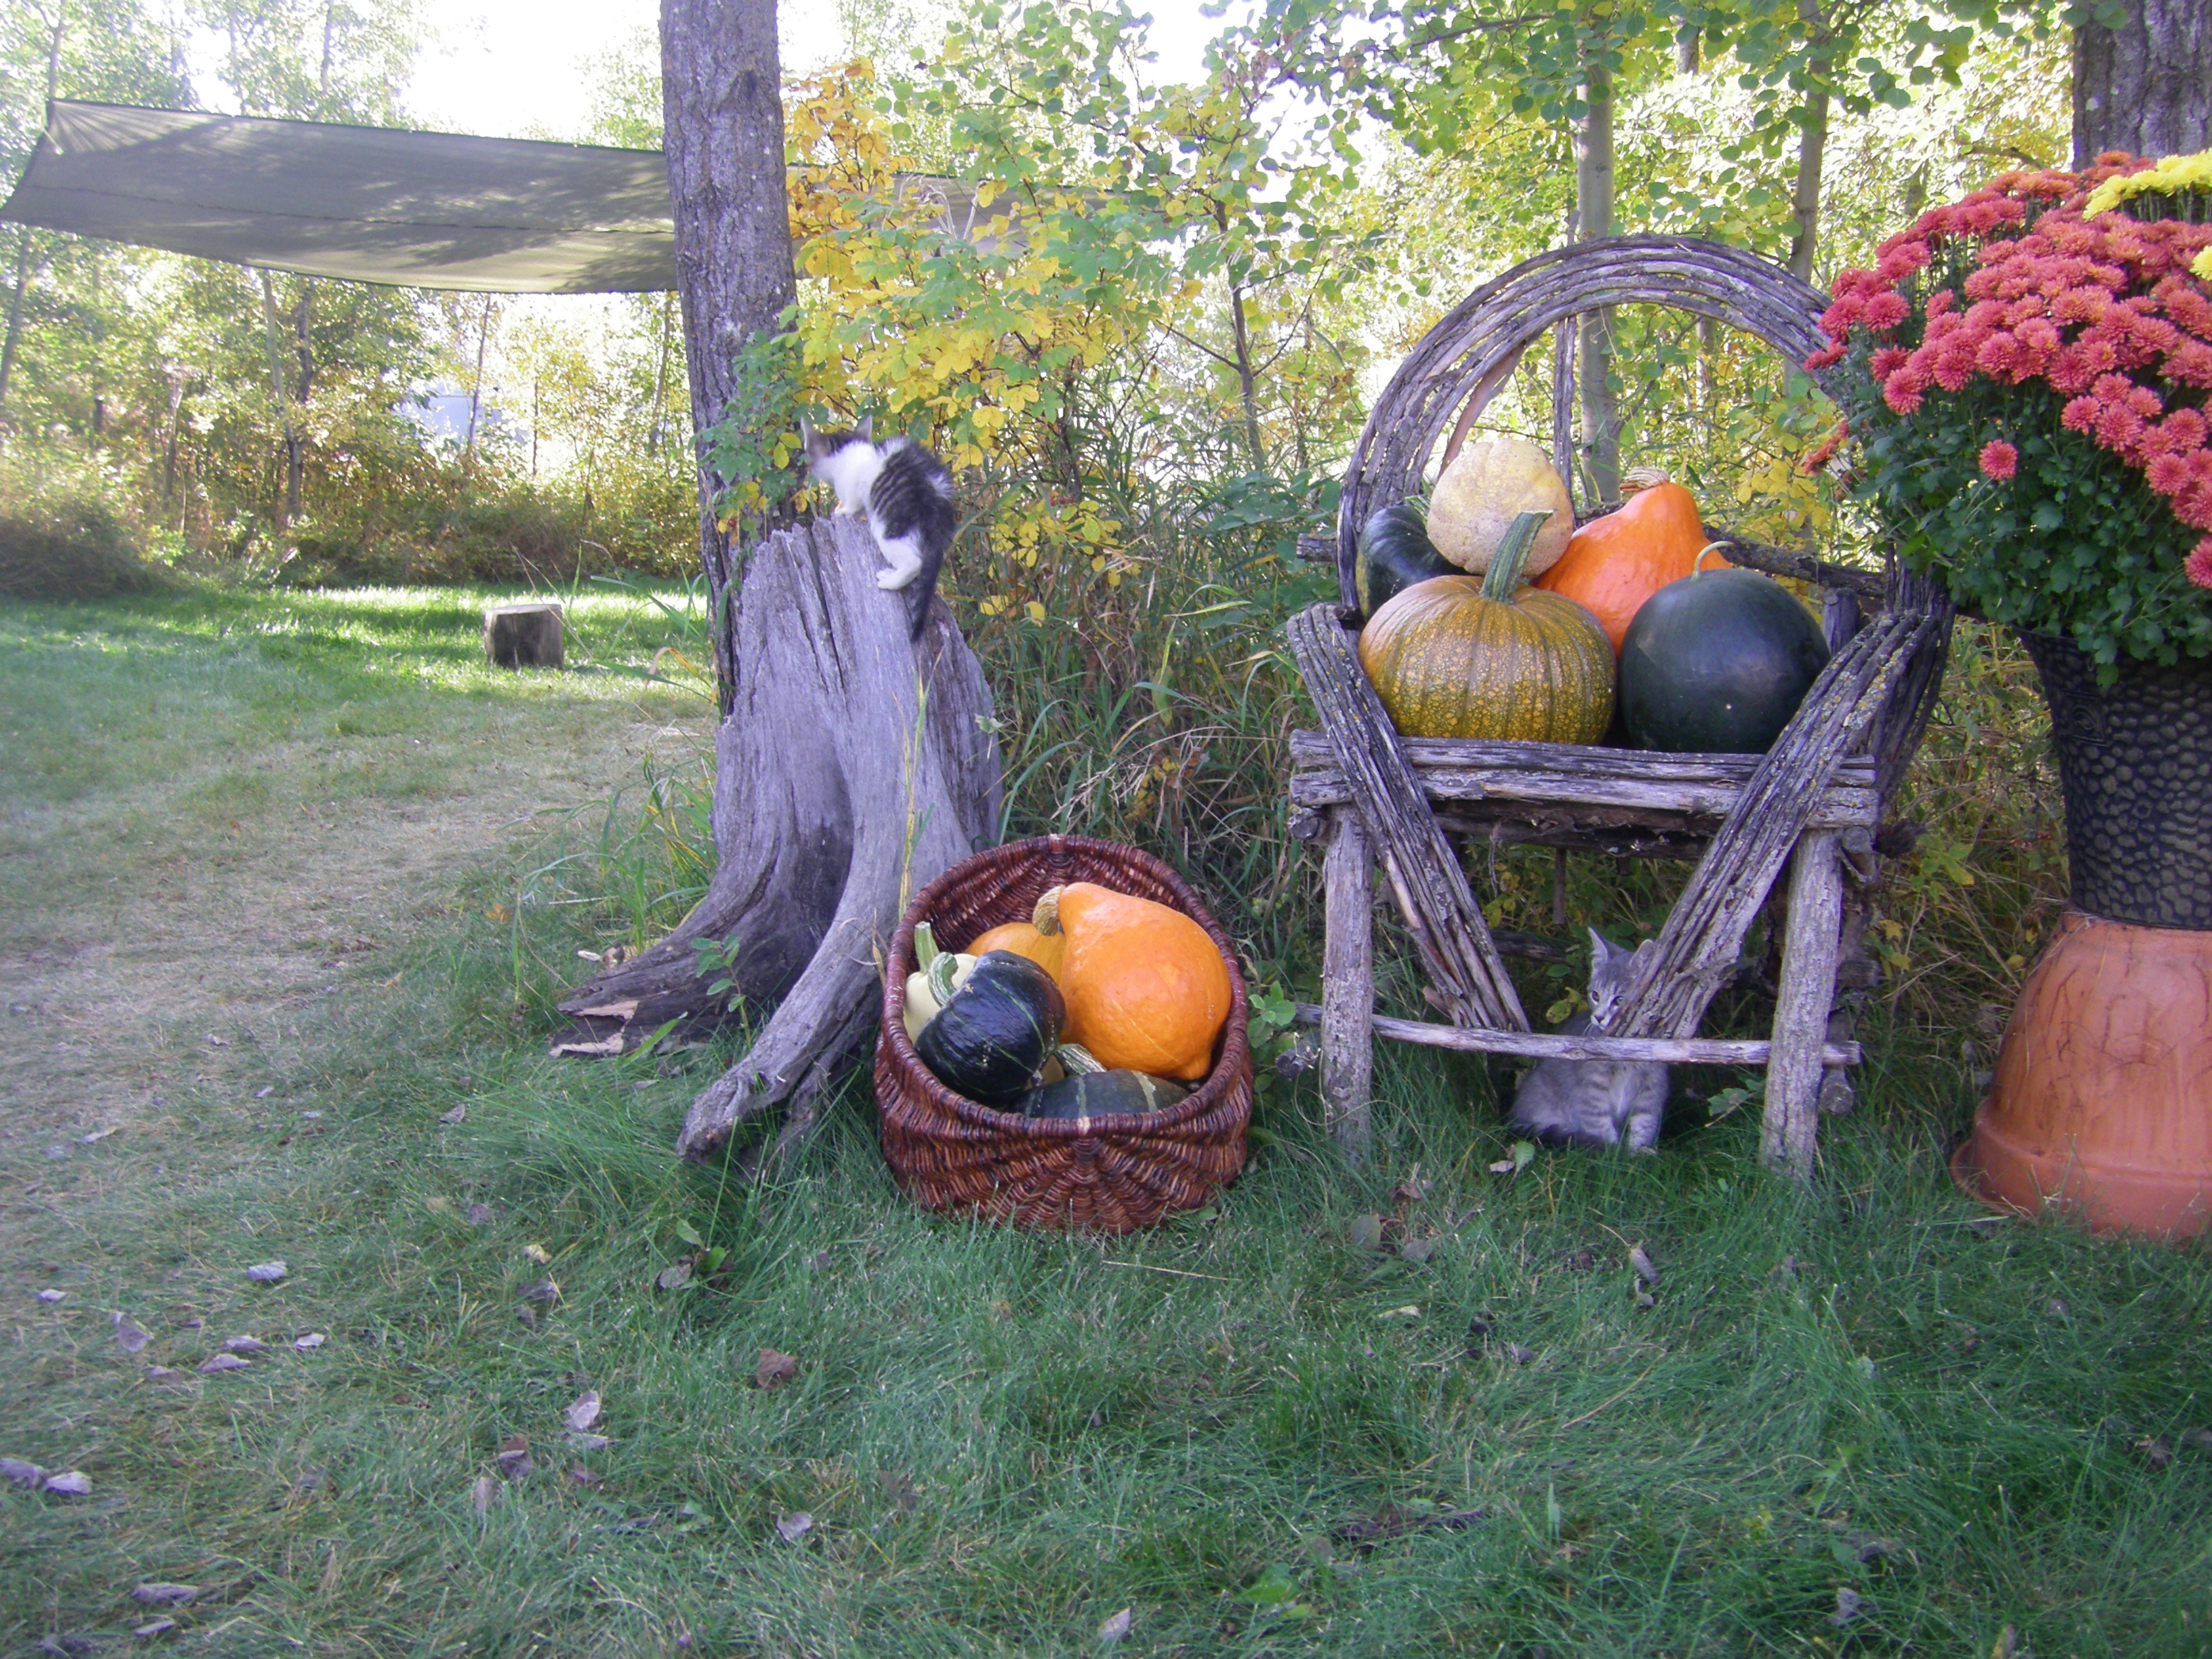 Harvest Day Squash